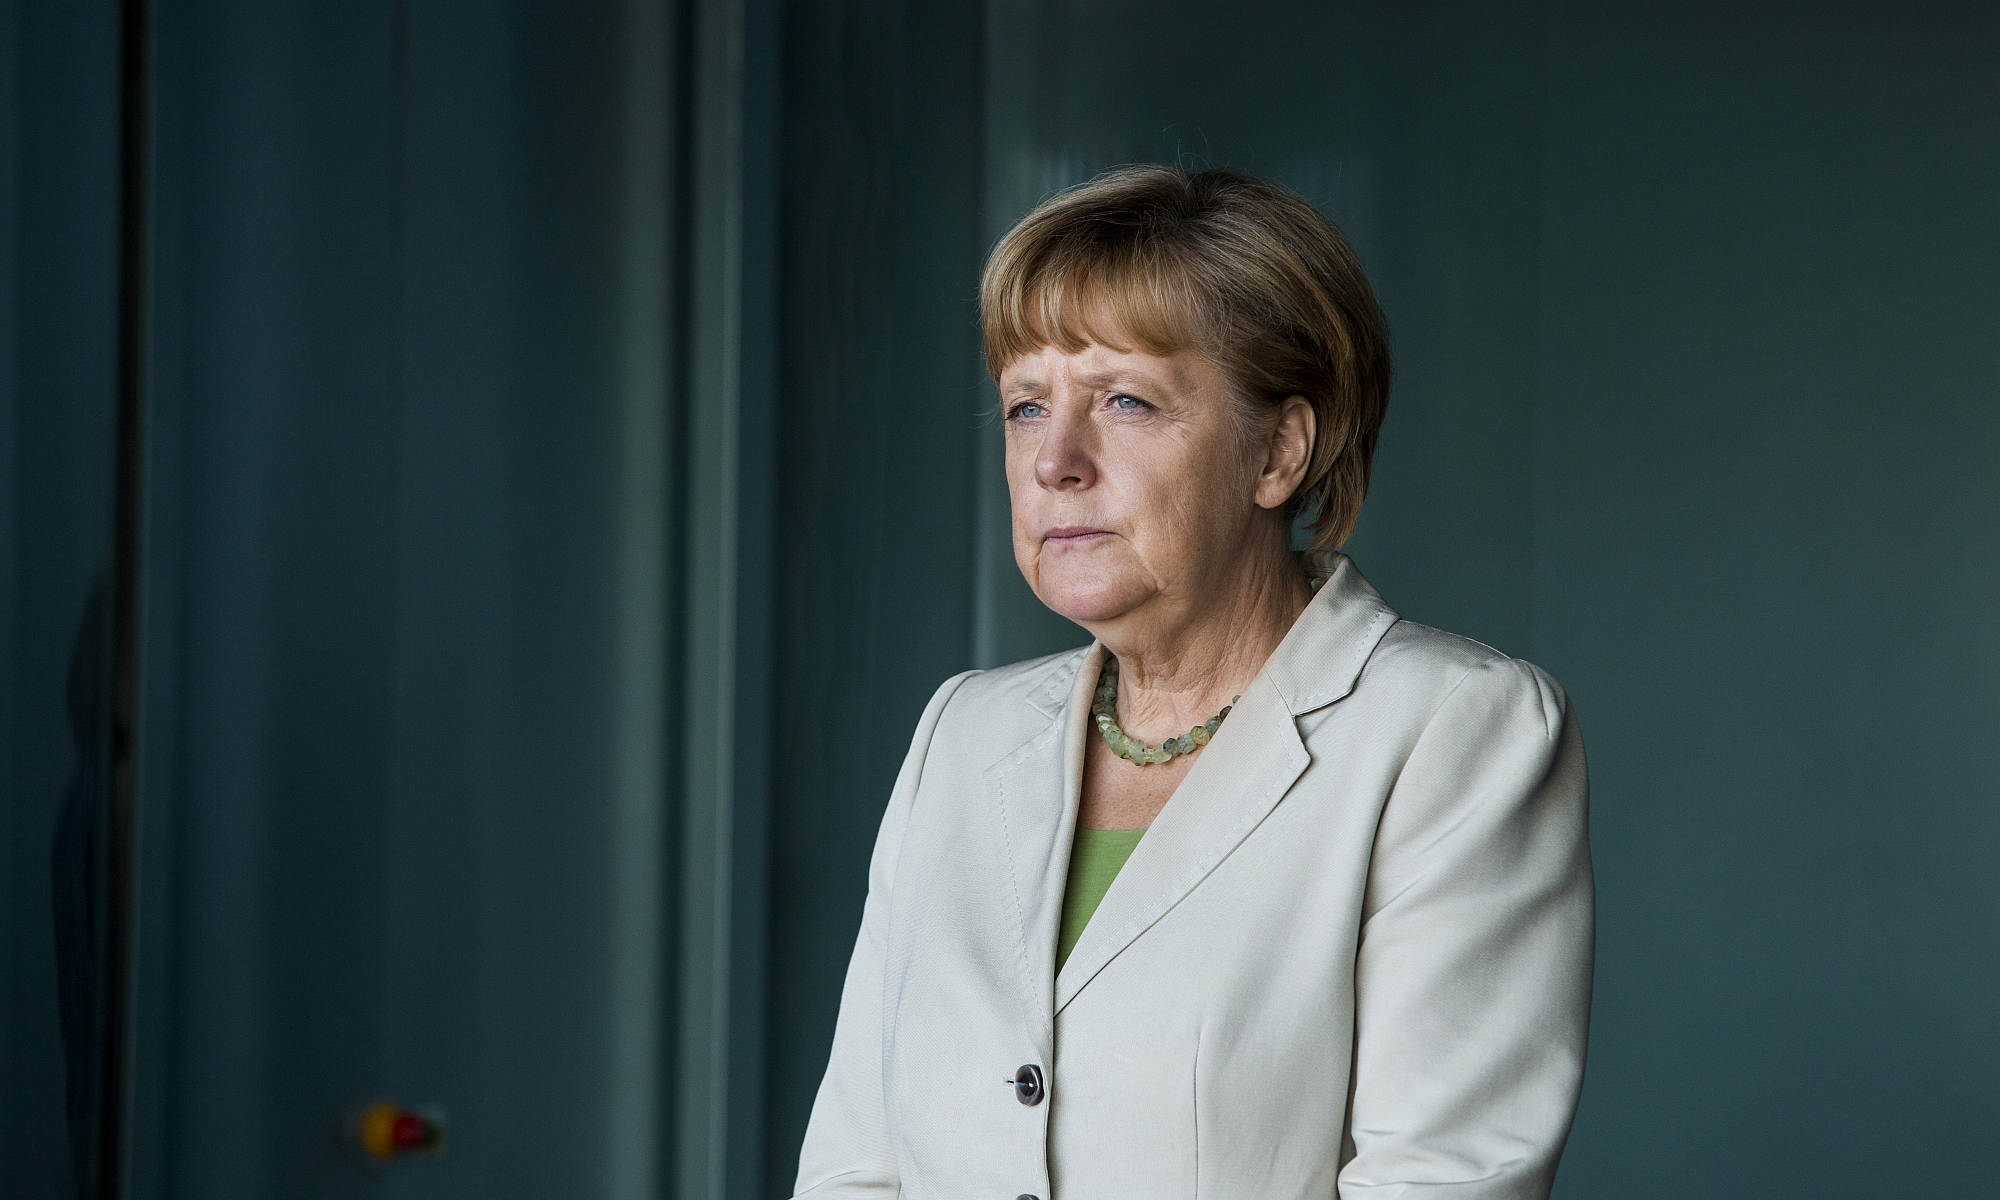 The myth of Angela Merkel